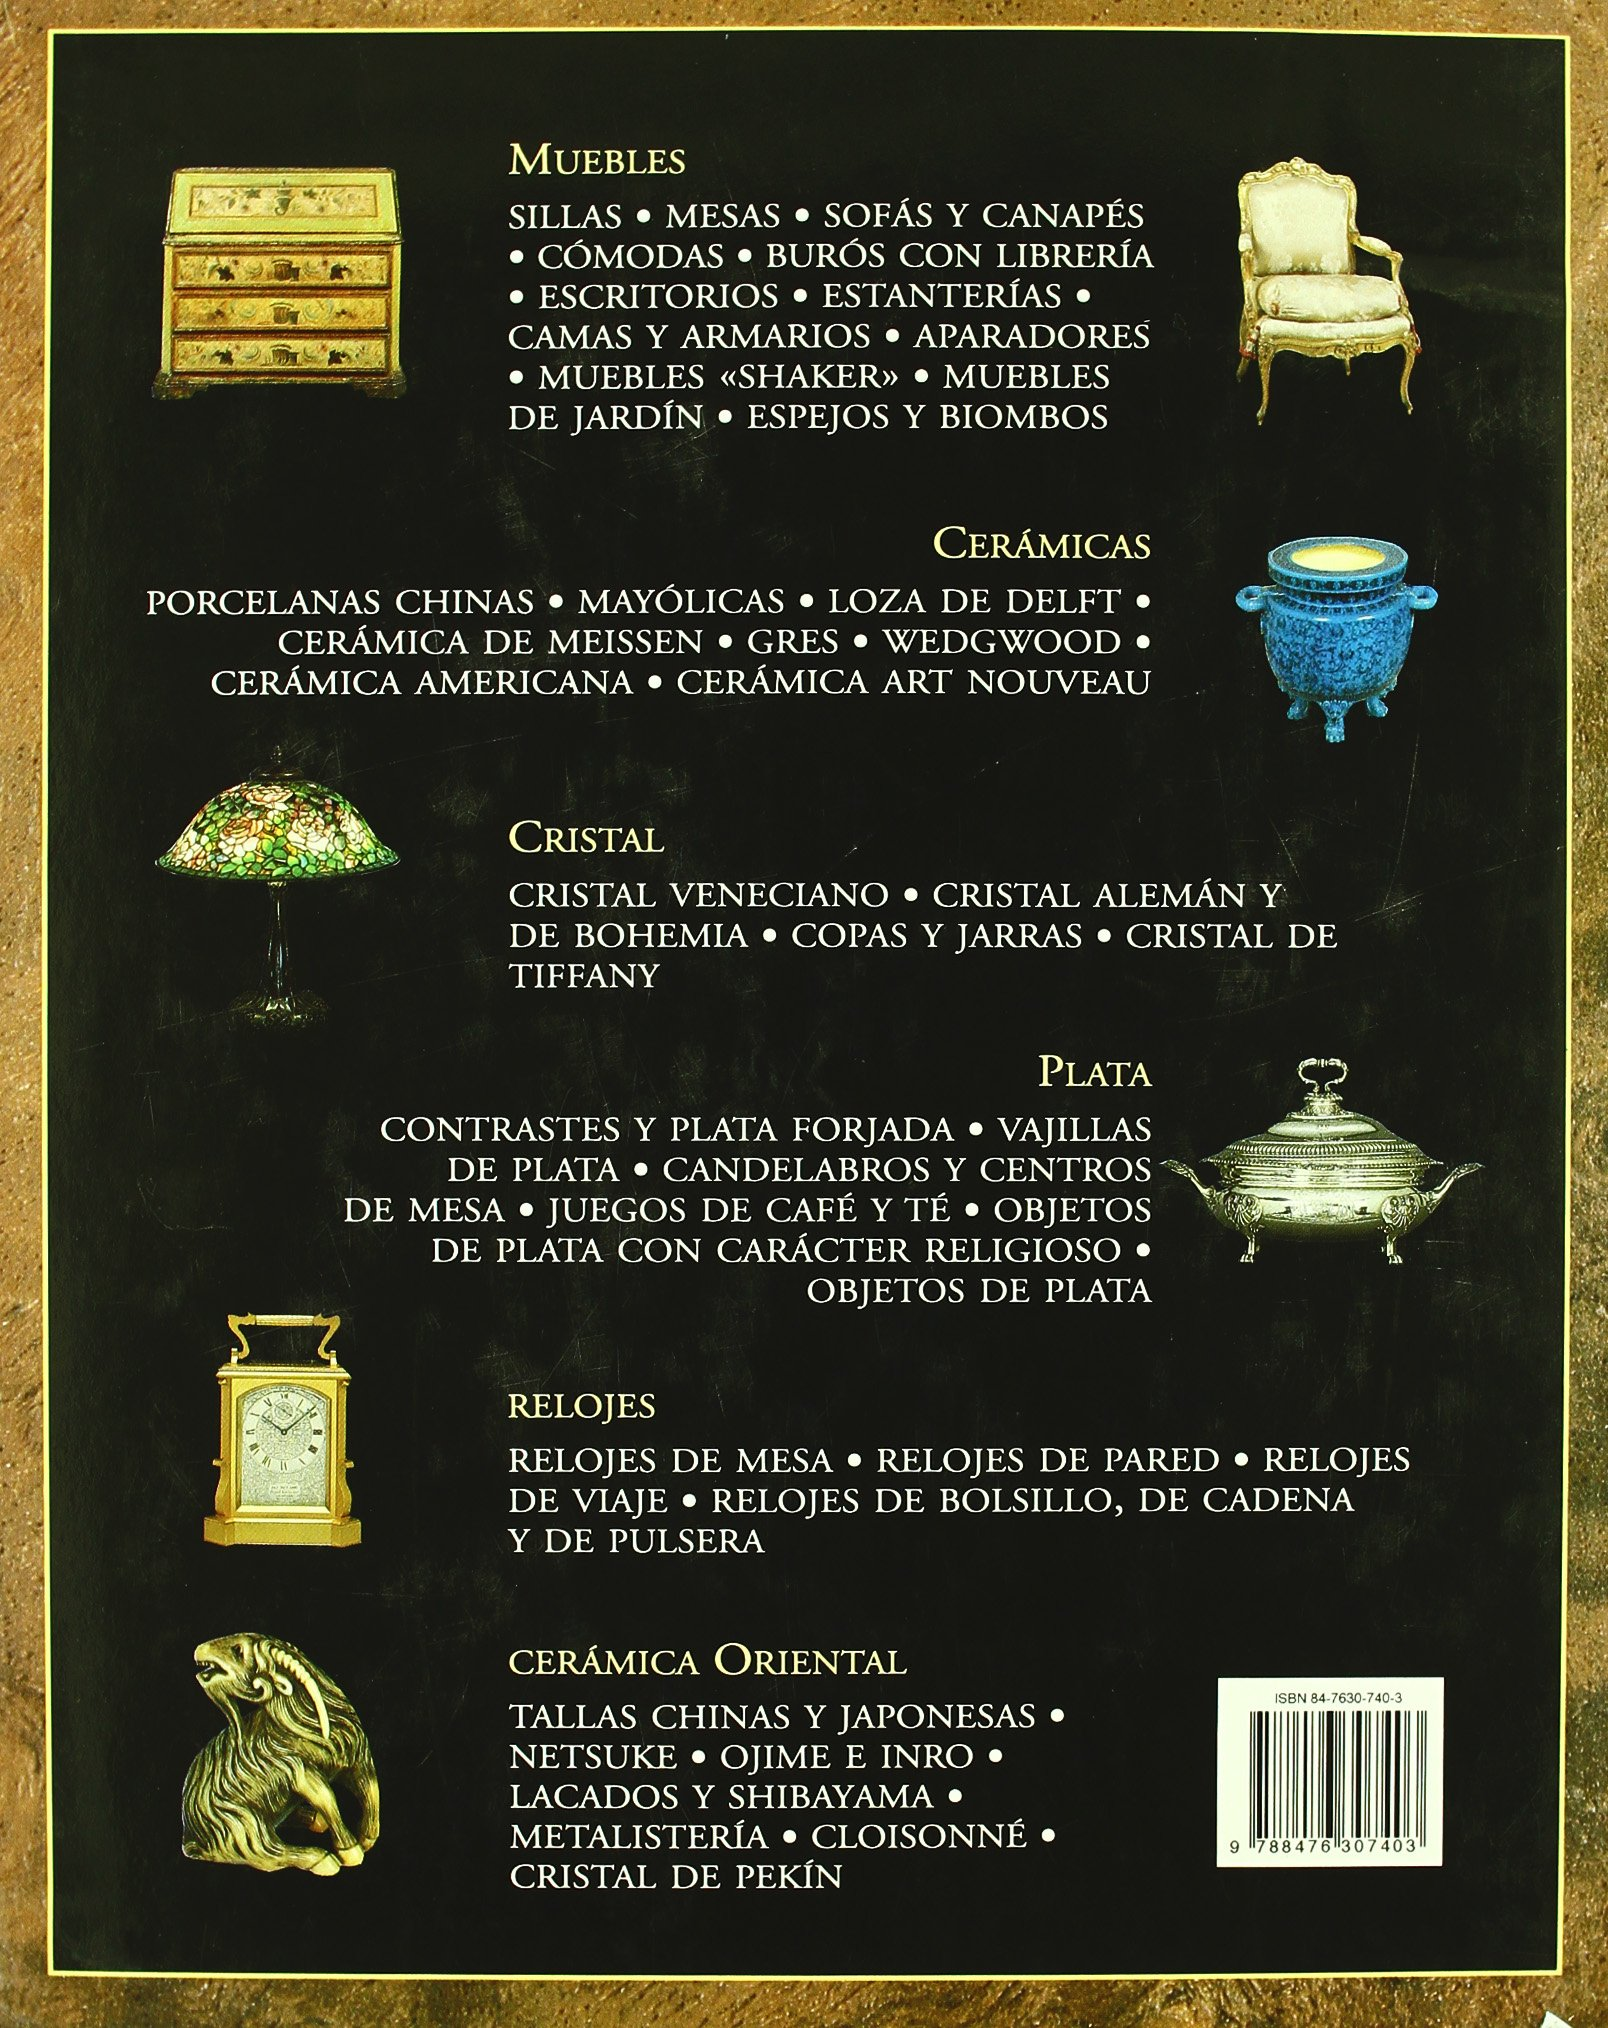 Enciclopedia de las antigüedades: Paul; Tharp, Lars Atterbury: 9788476307403: Amazon.com: Books